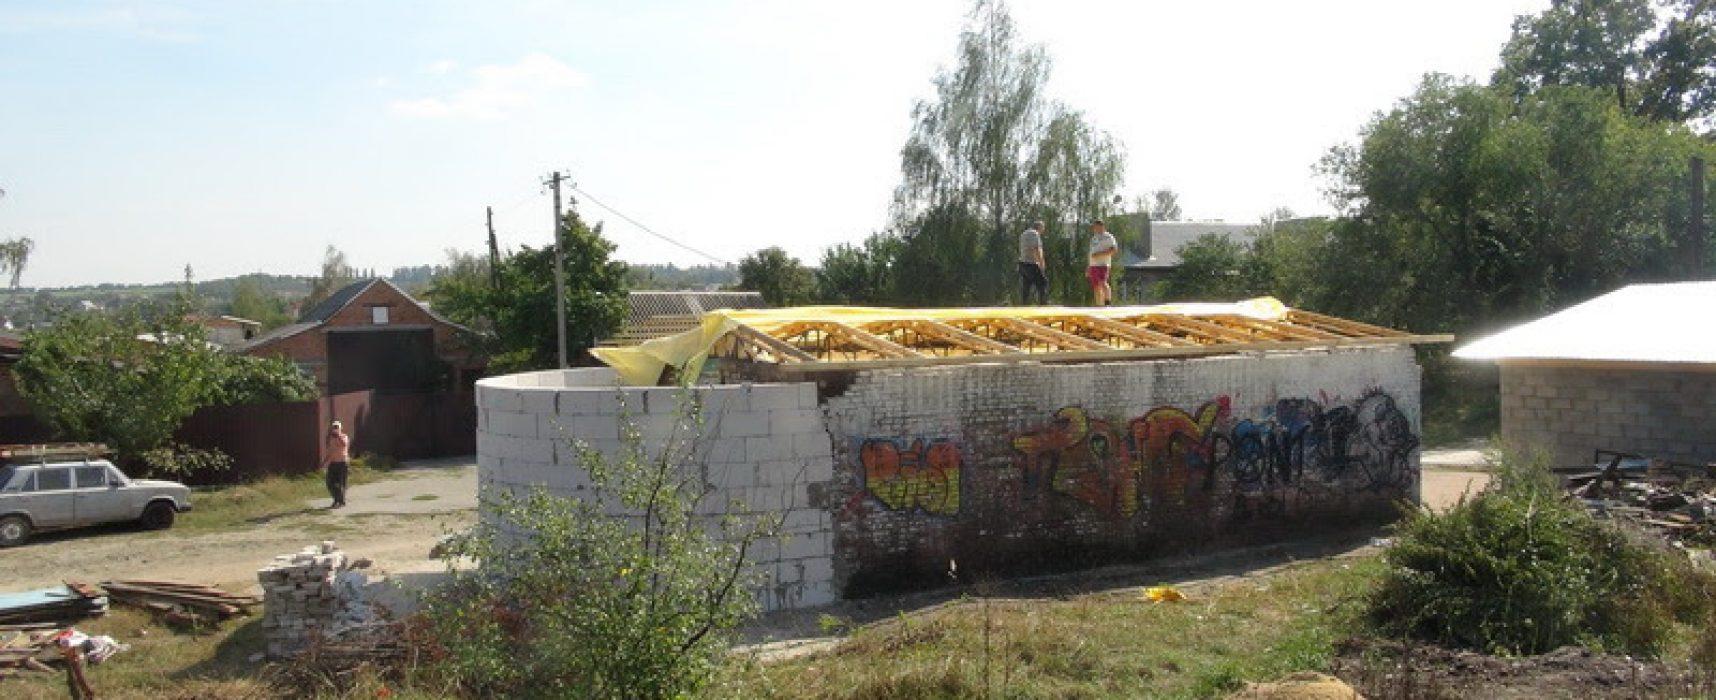 Fake: Radicale Oekraïense nationalisten slopen kerken van het Moskouse patriarchaat